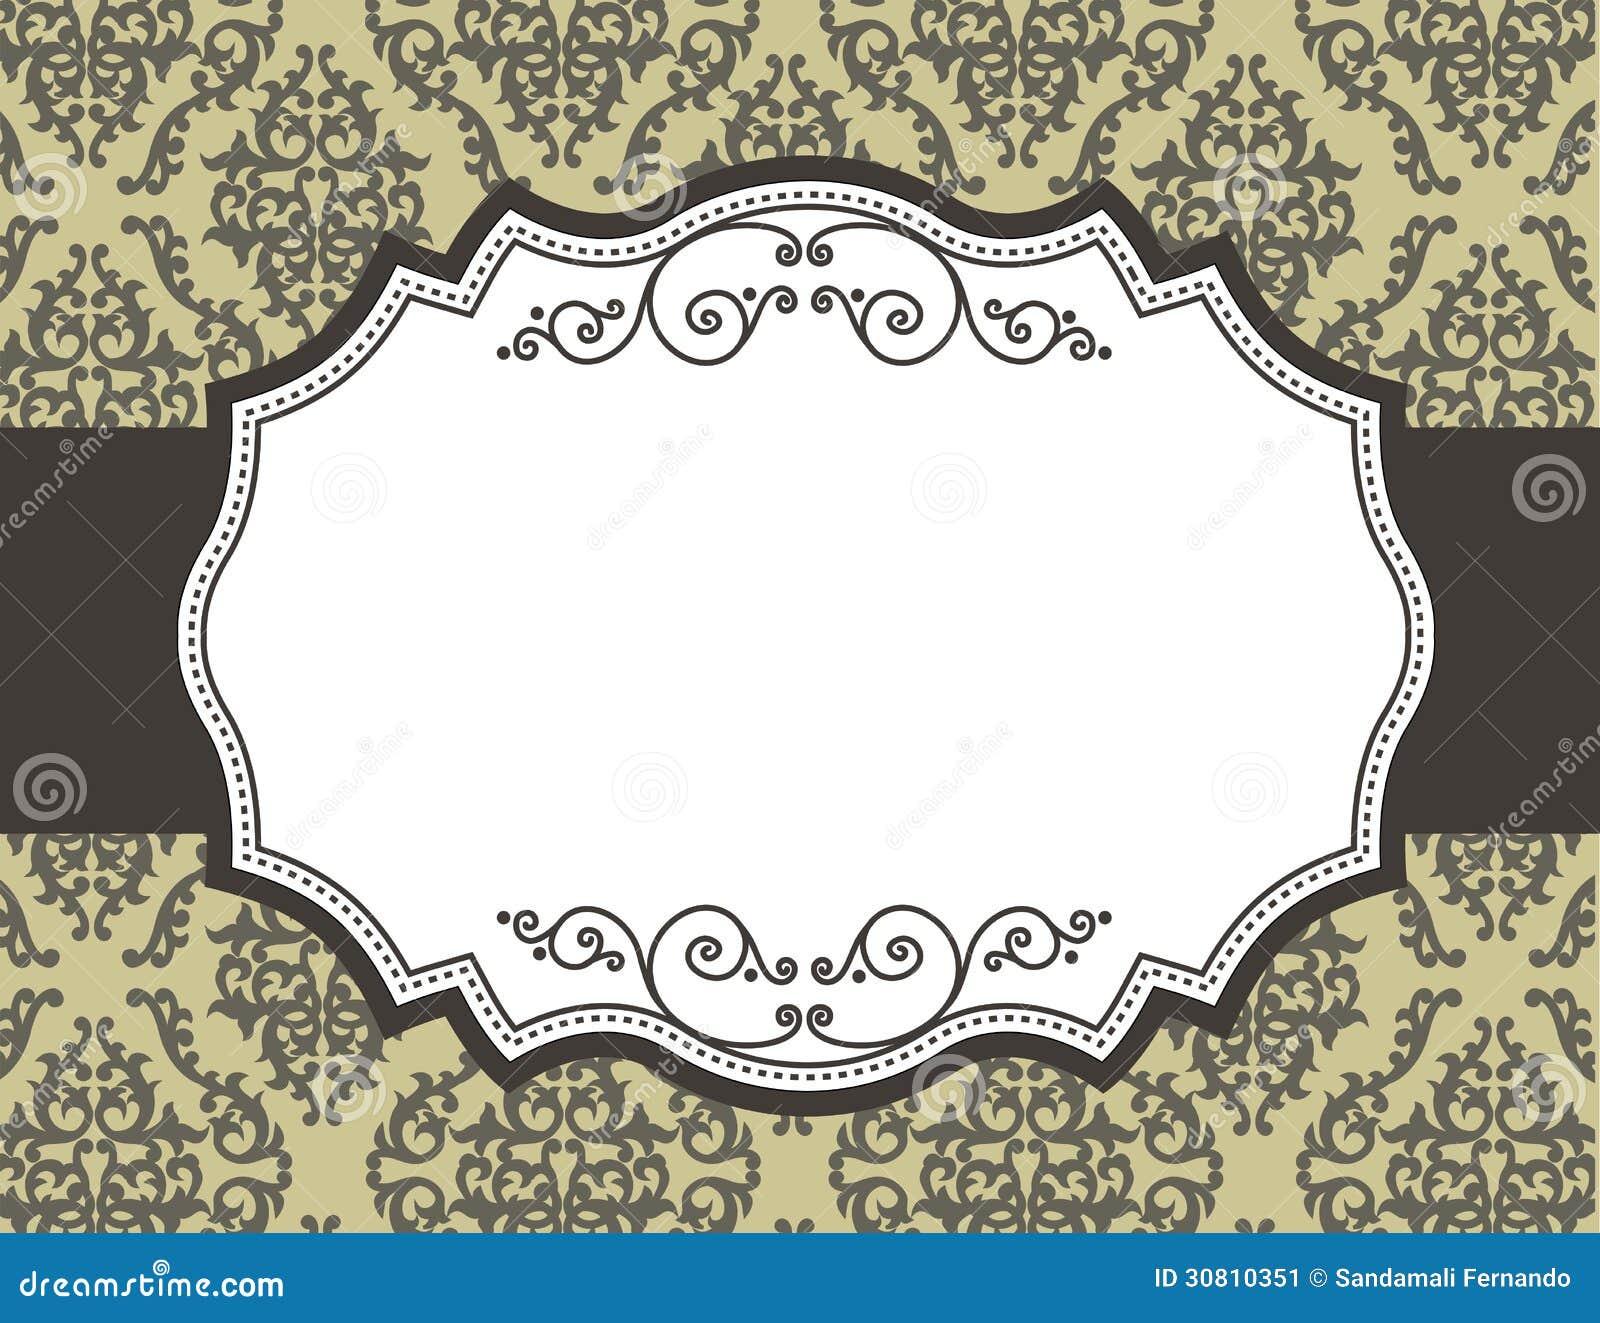 How To Make Watercolor Wedding Invitations as good invitation design